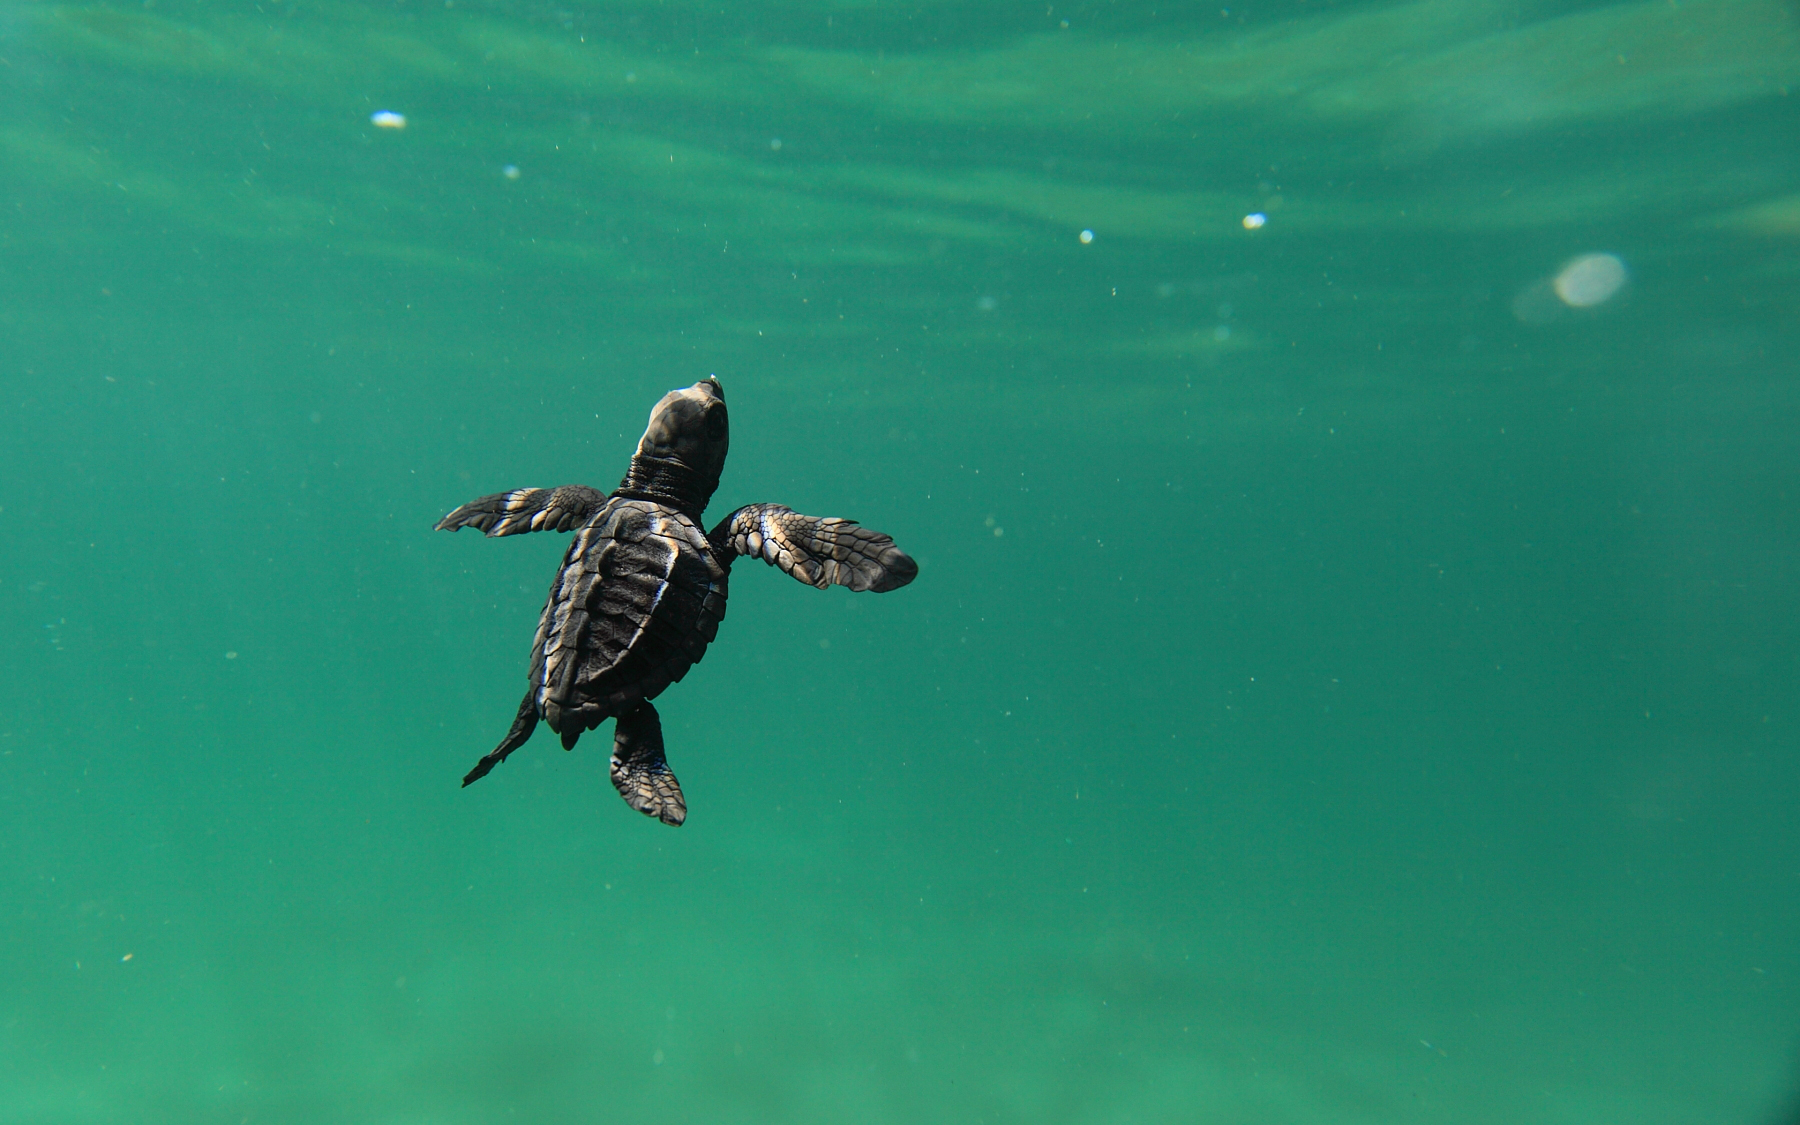 Photo courtesy of Playa Viva – sea turtle image by daniel_camerena_golfinaswim